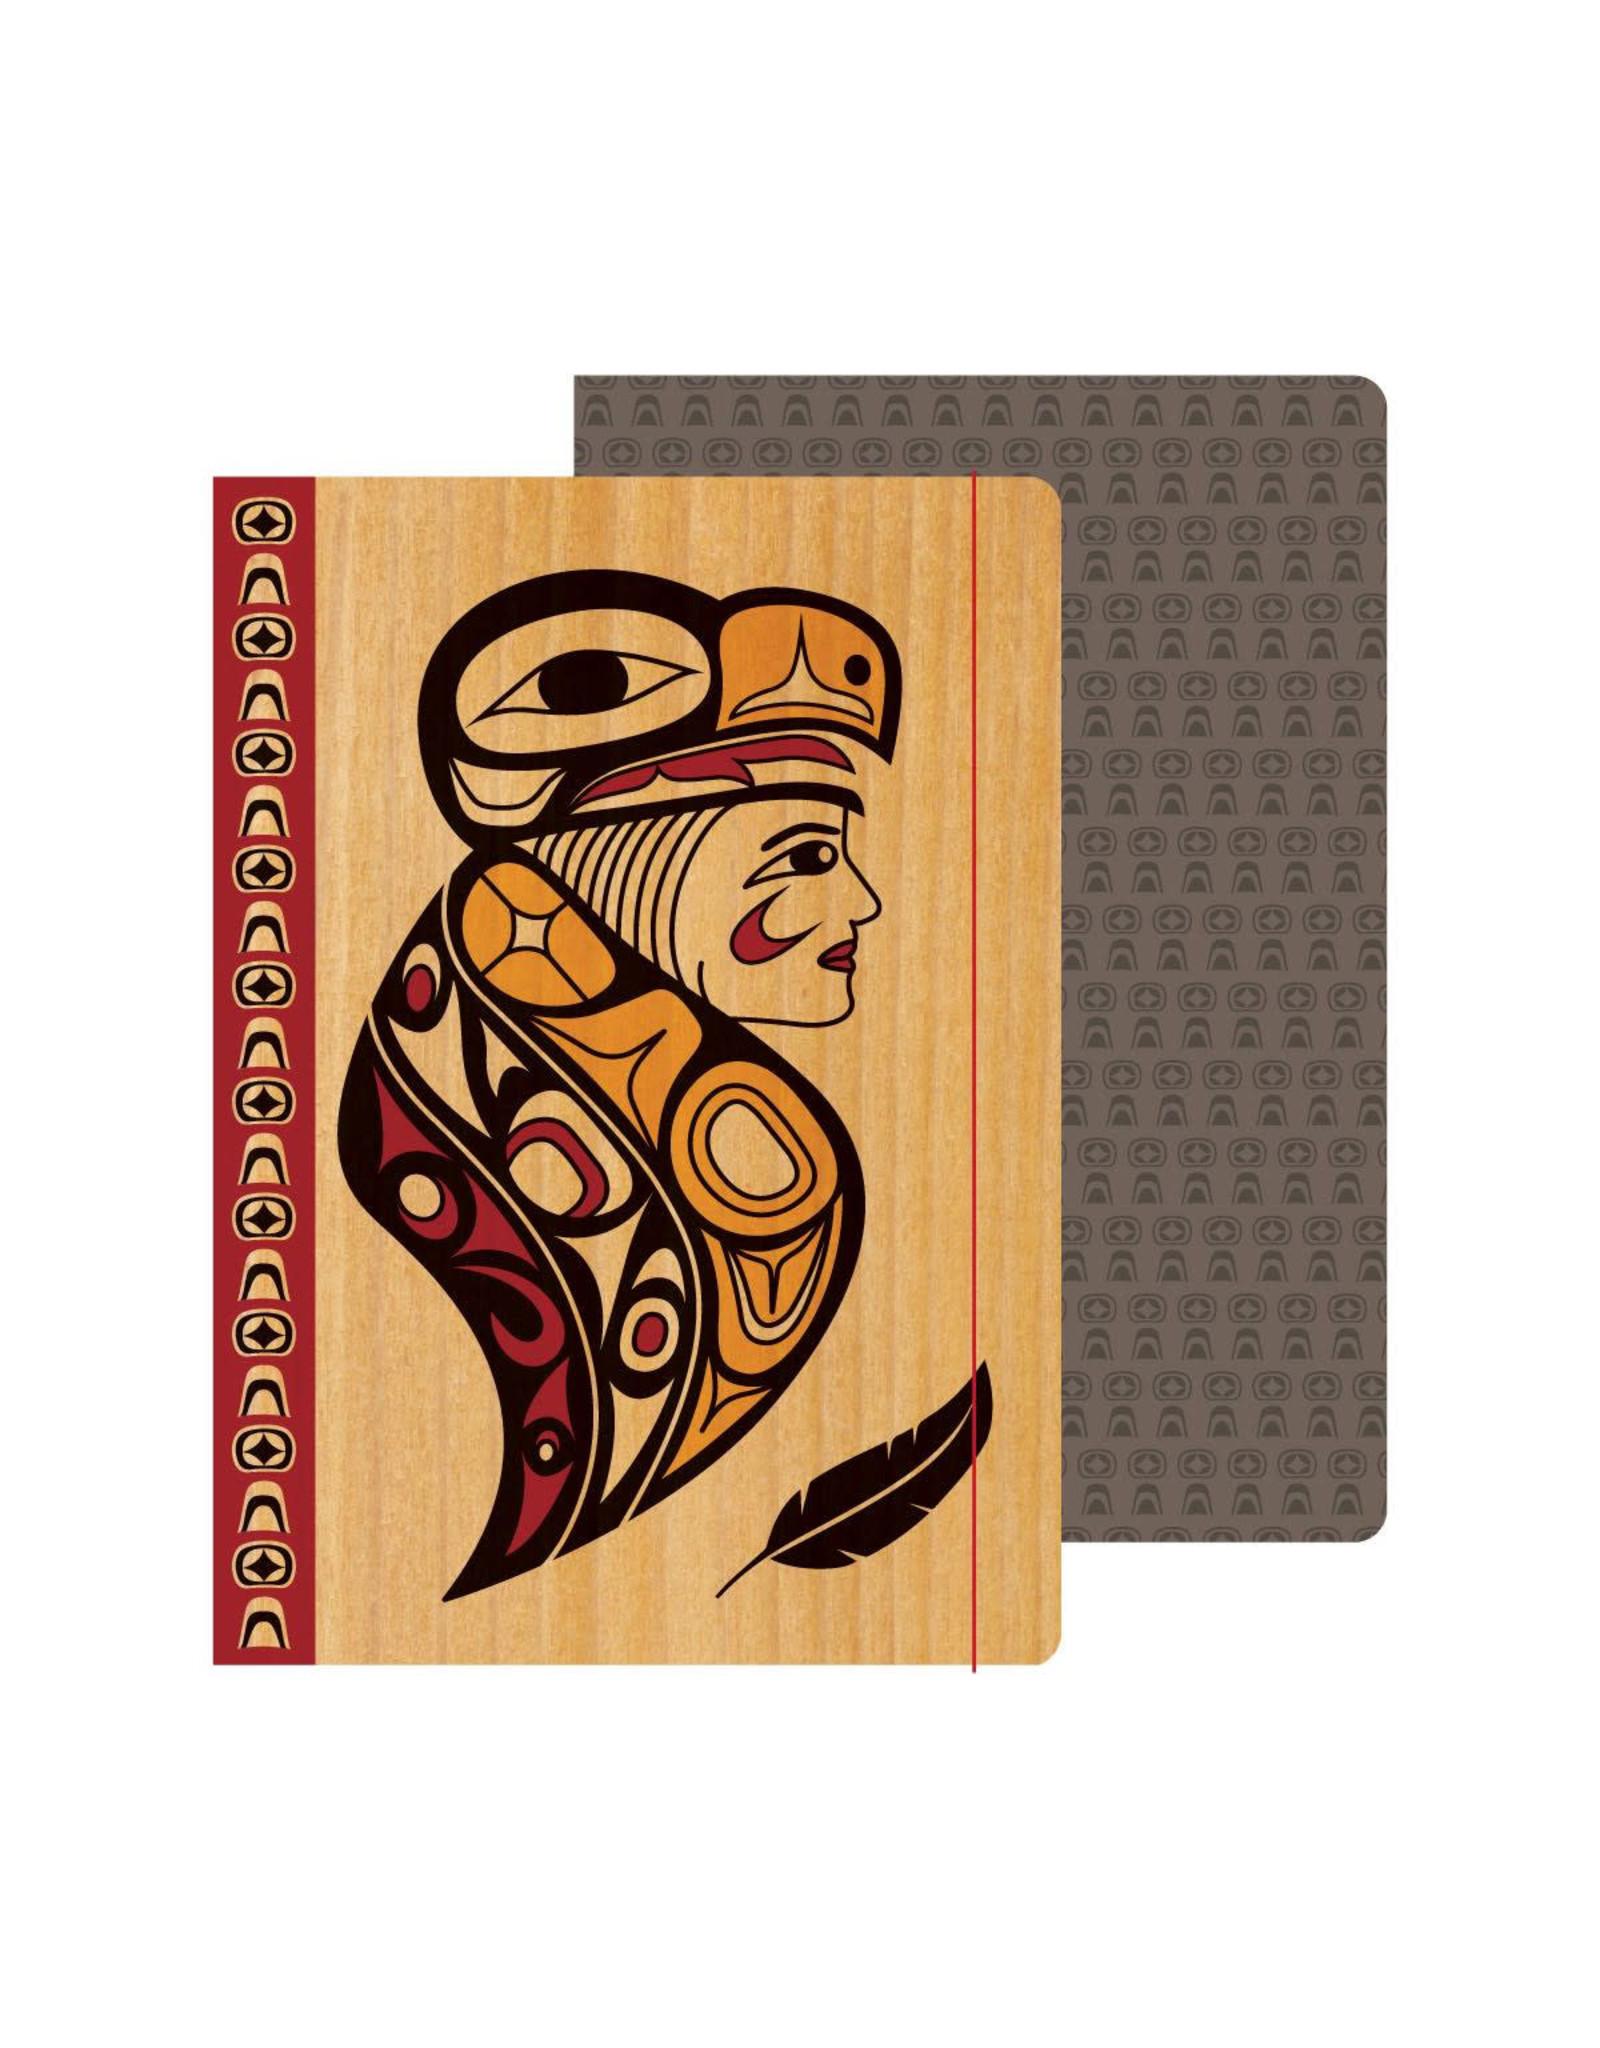 Journal - Eagle Woman par Melaney Gleeson-Lyall (JRL7)